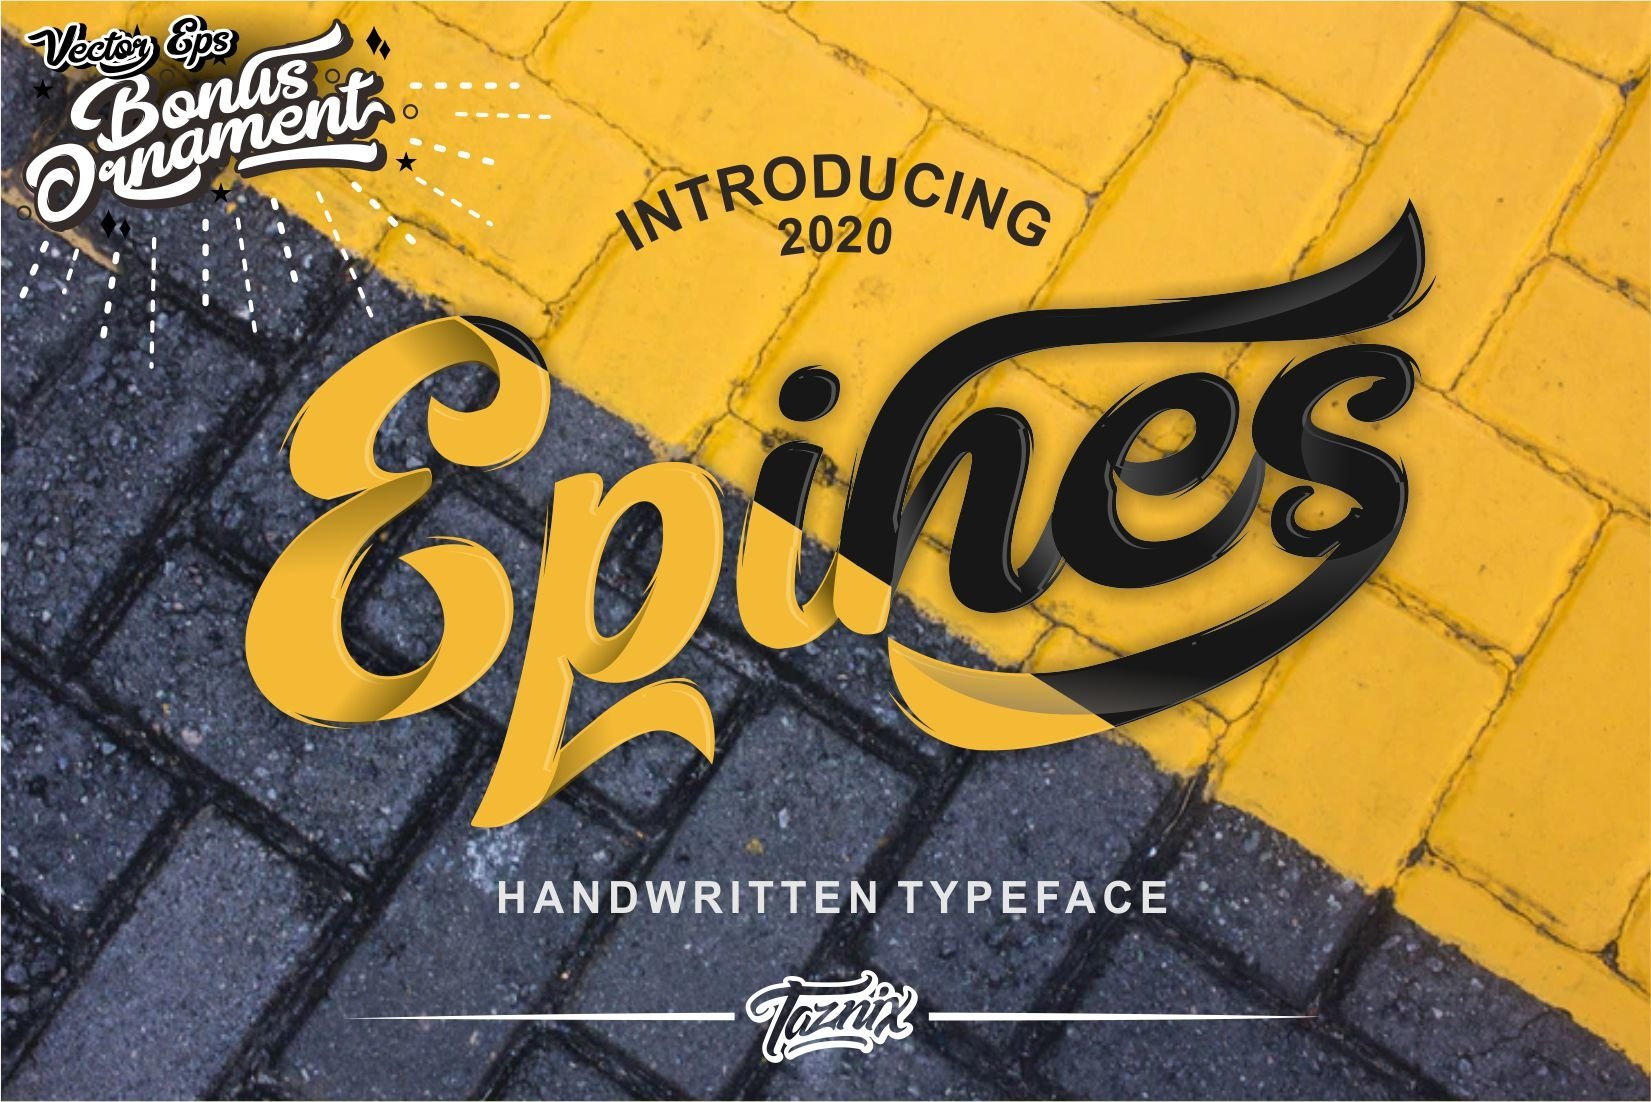 Epines Bold Brush Modern Script Bonus Swash example image 1